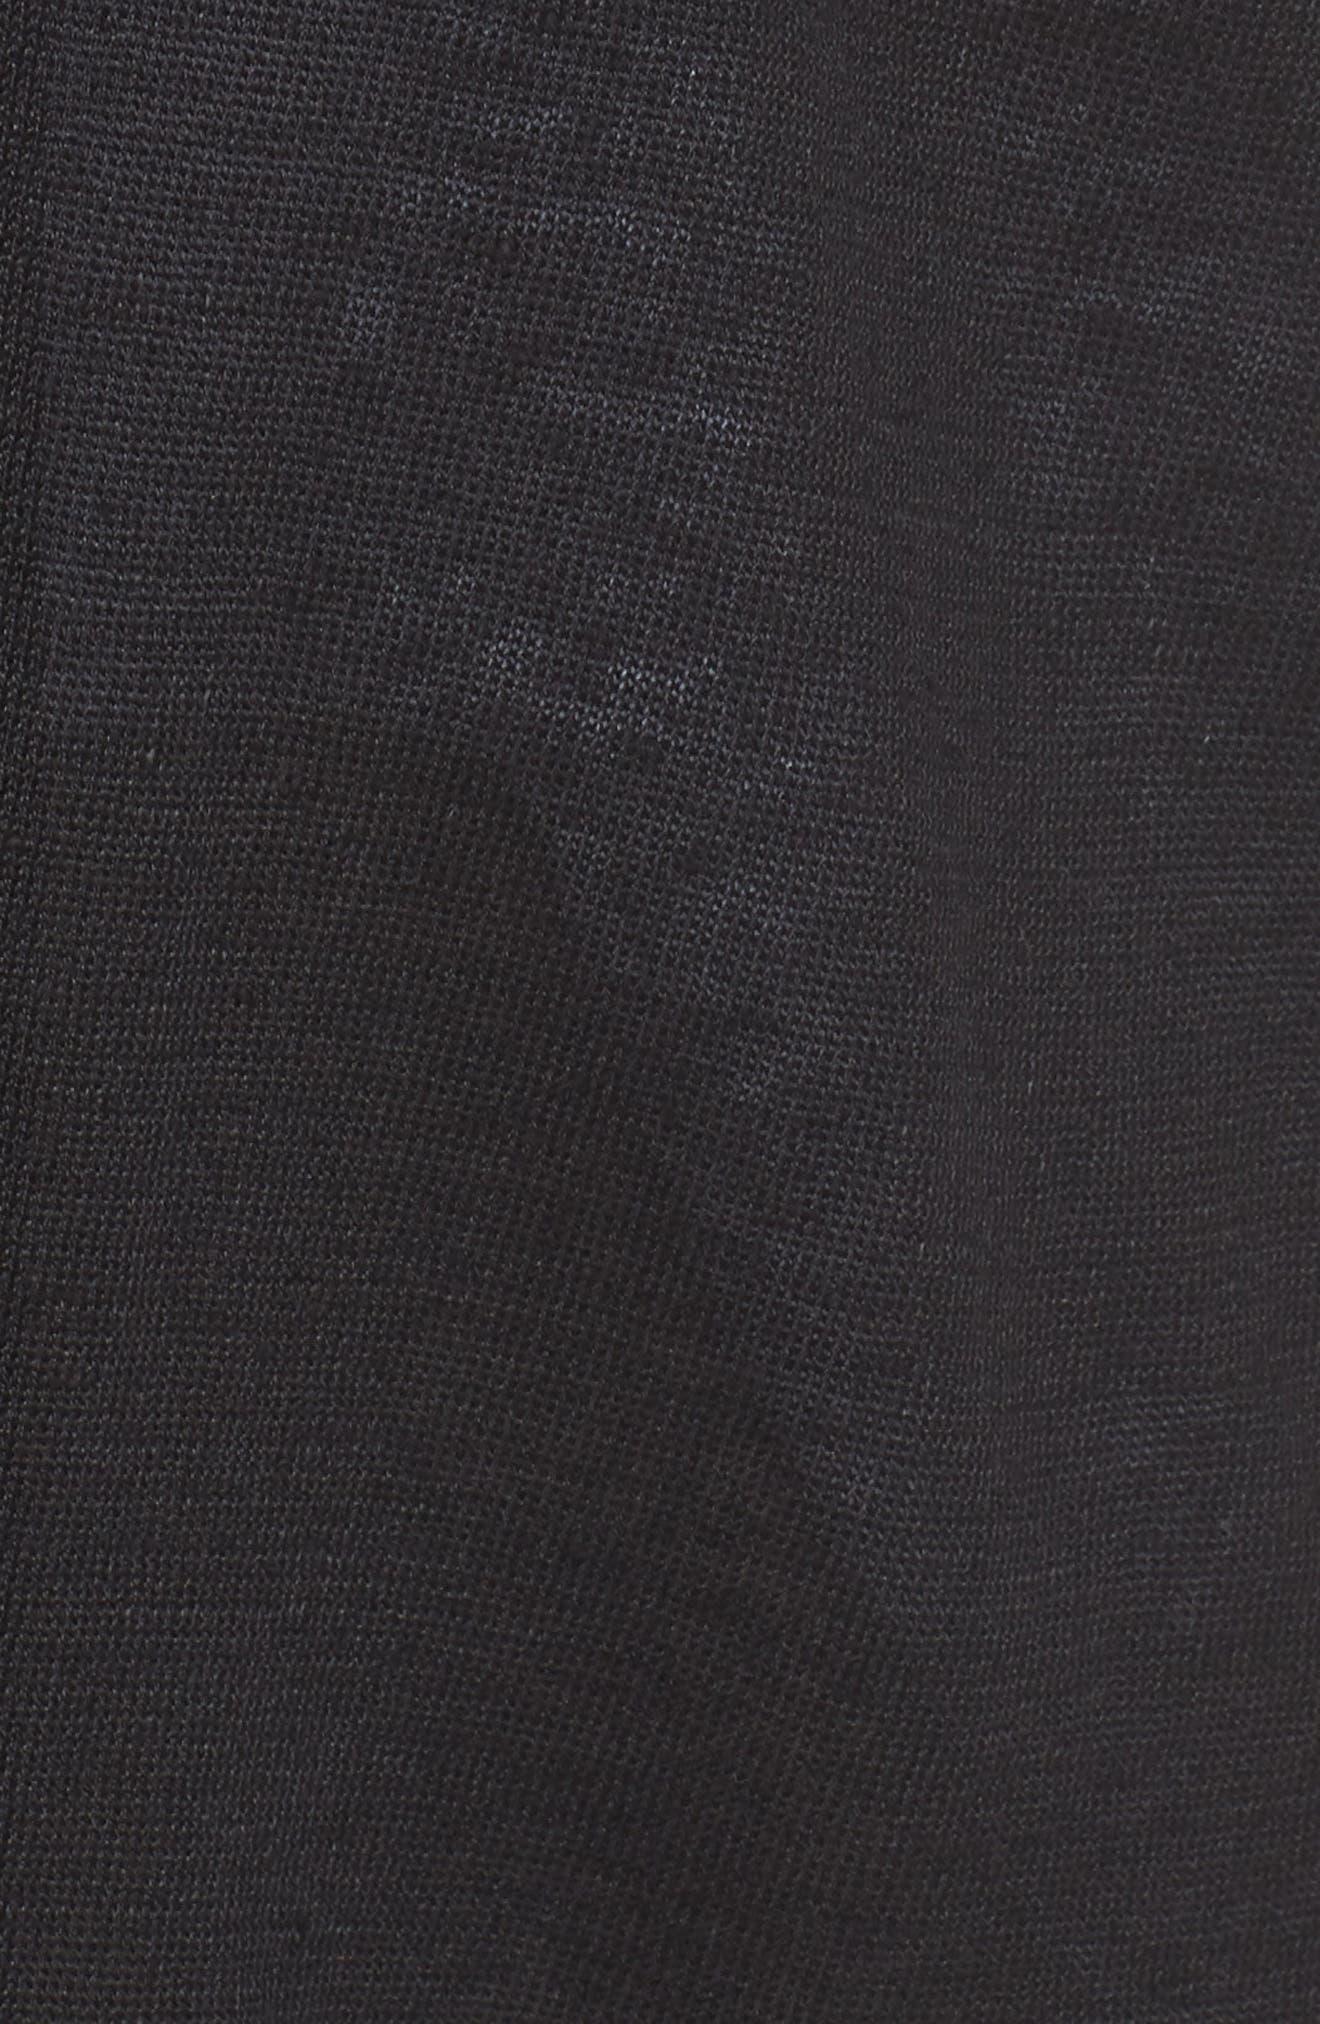 Organic Linen Cardigan,                             Alternate thumbnail 6, color,                             001